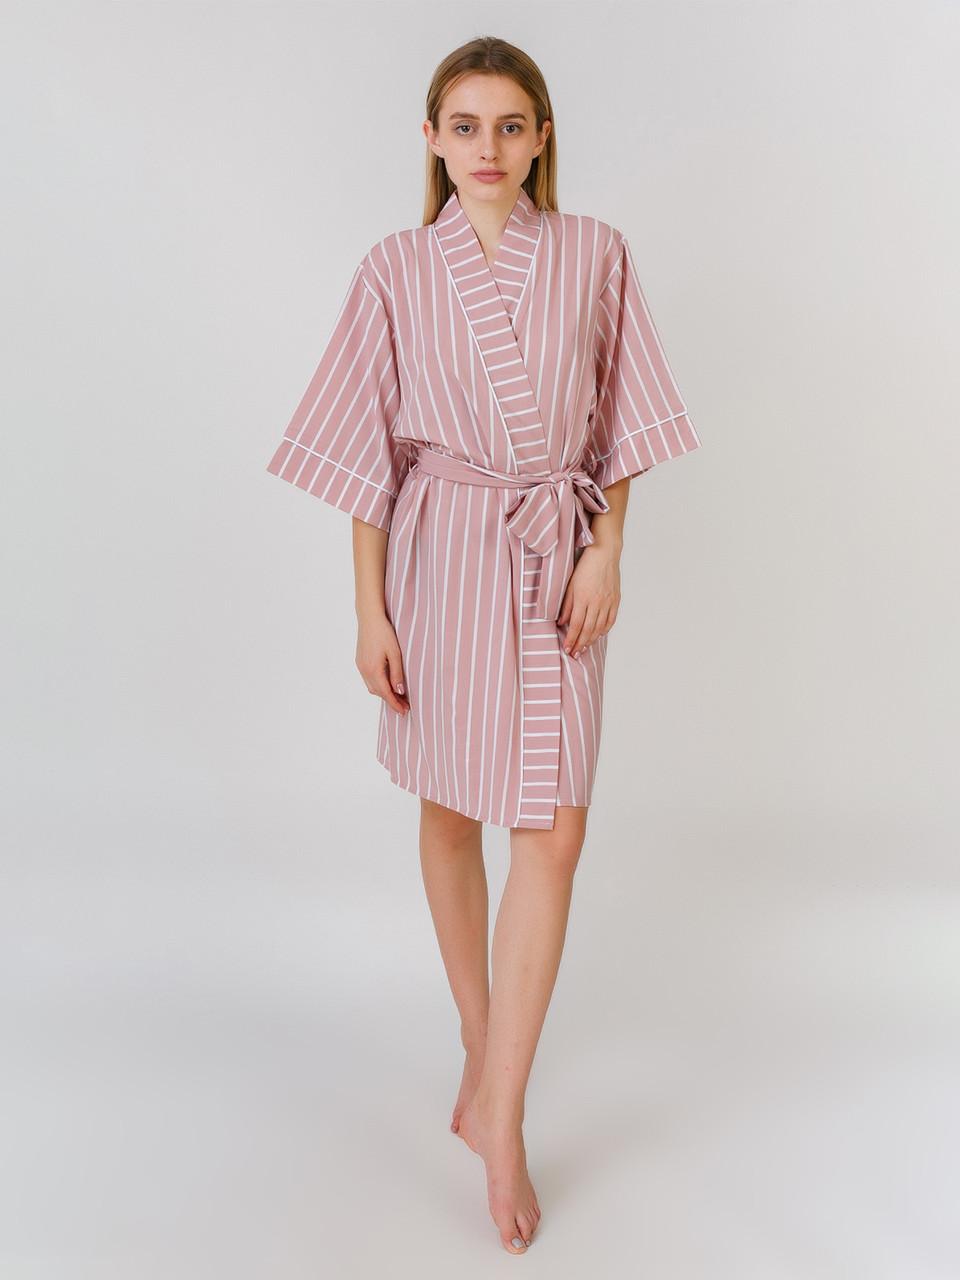 1501 халат софт рожевий Serenade (L/XL) #N/A